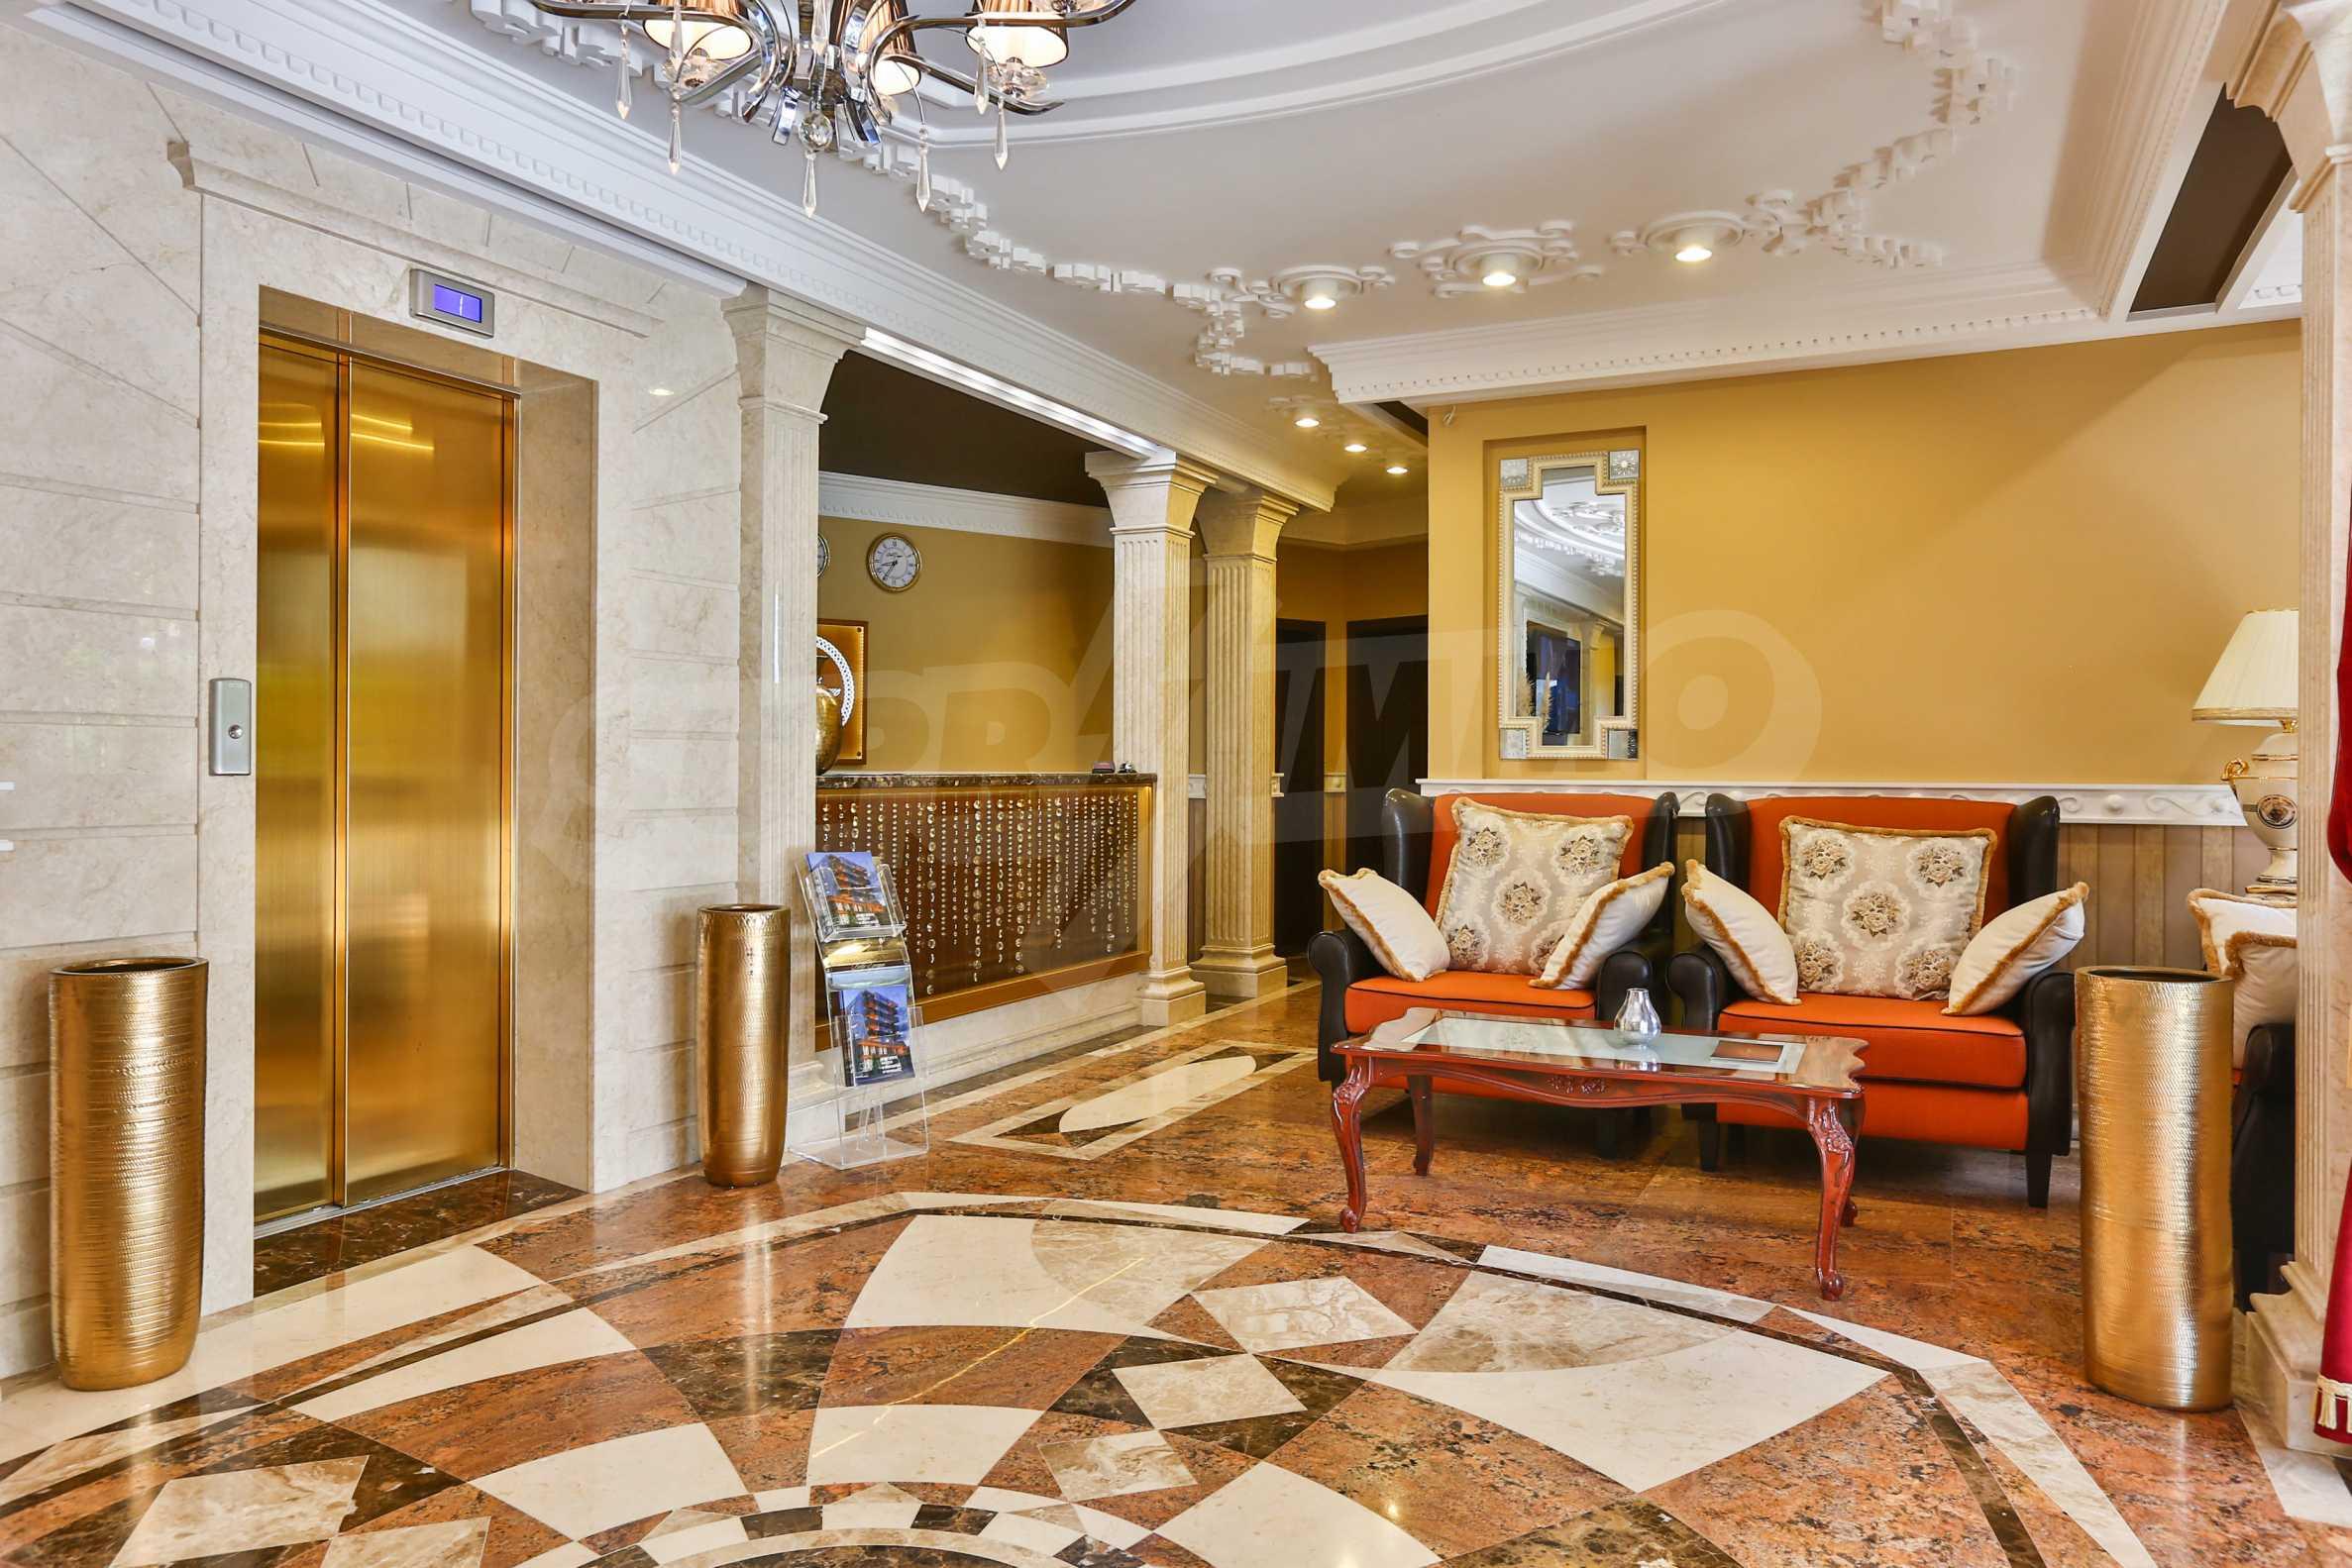 Дизайнерски тристаен апартамент под наем за летен сезон в резиденция Belle Époque в Лозенец 35